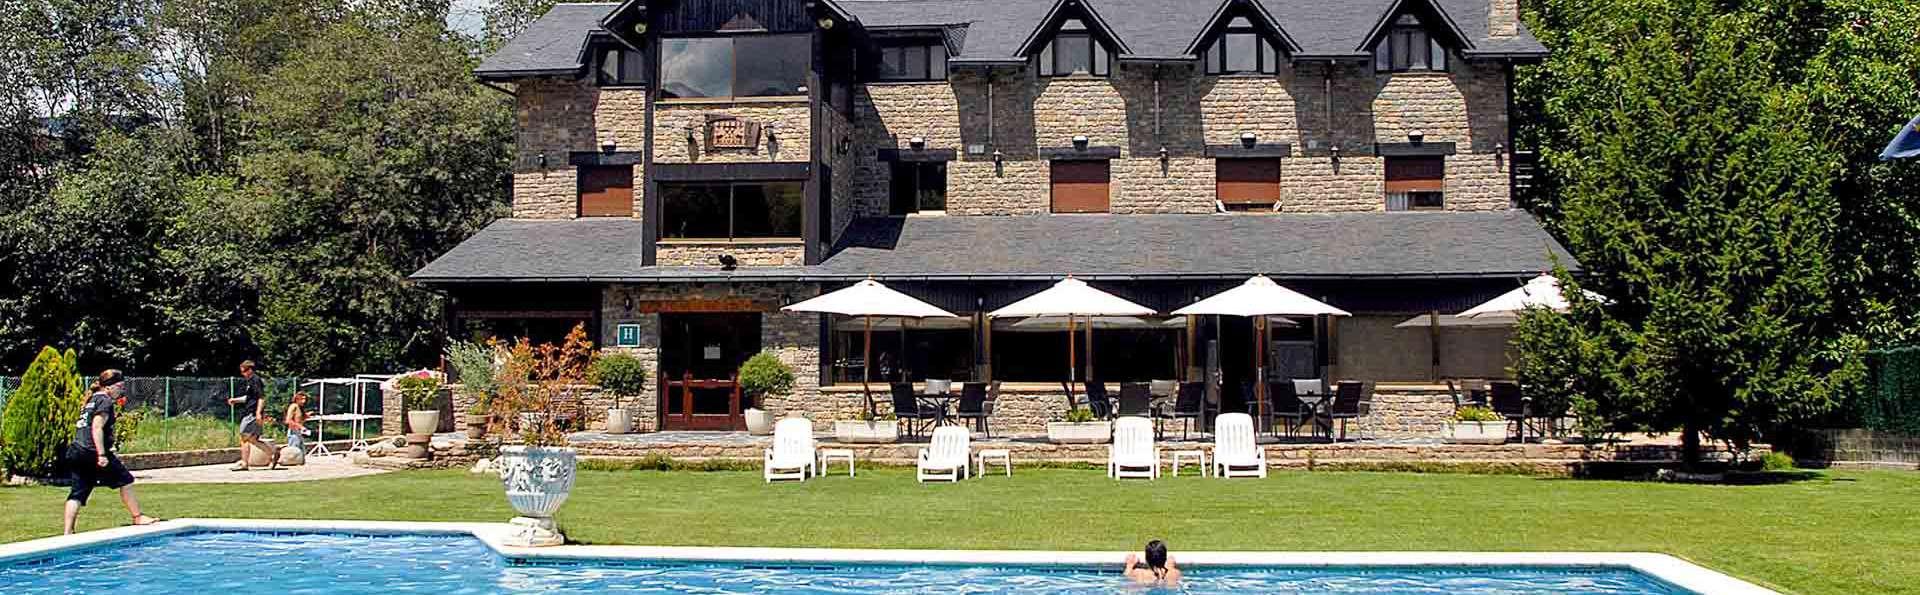 Hotel Flórido - EDIT_hotelexterior_06.jpg